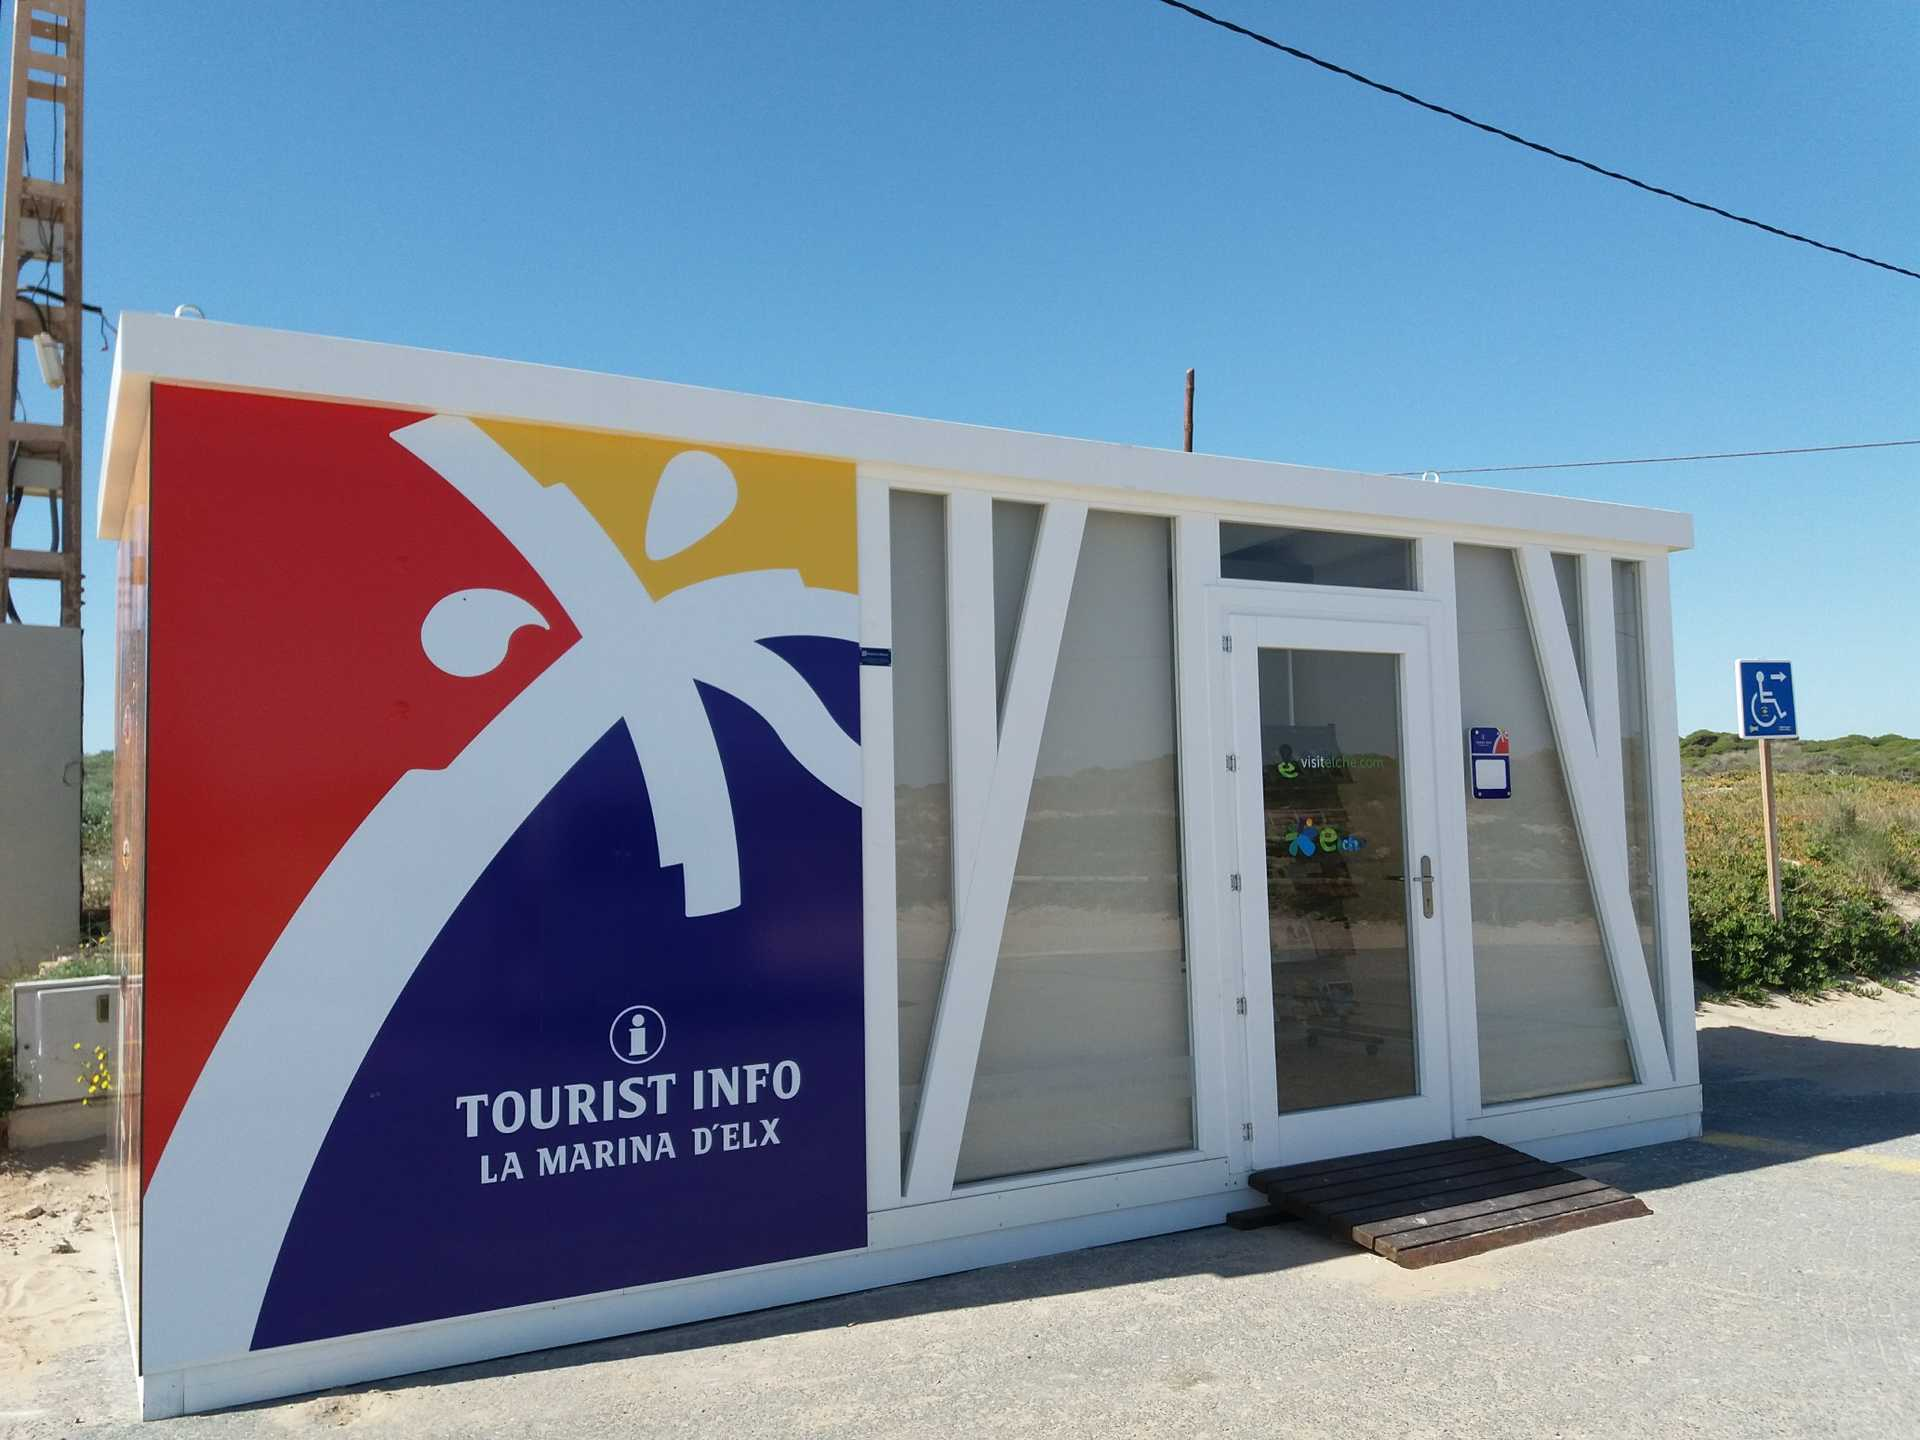 TOURIST INFO LA MARINA D'ELX